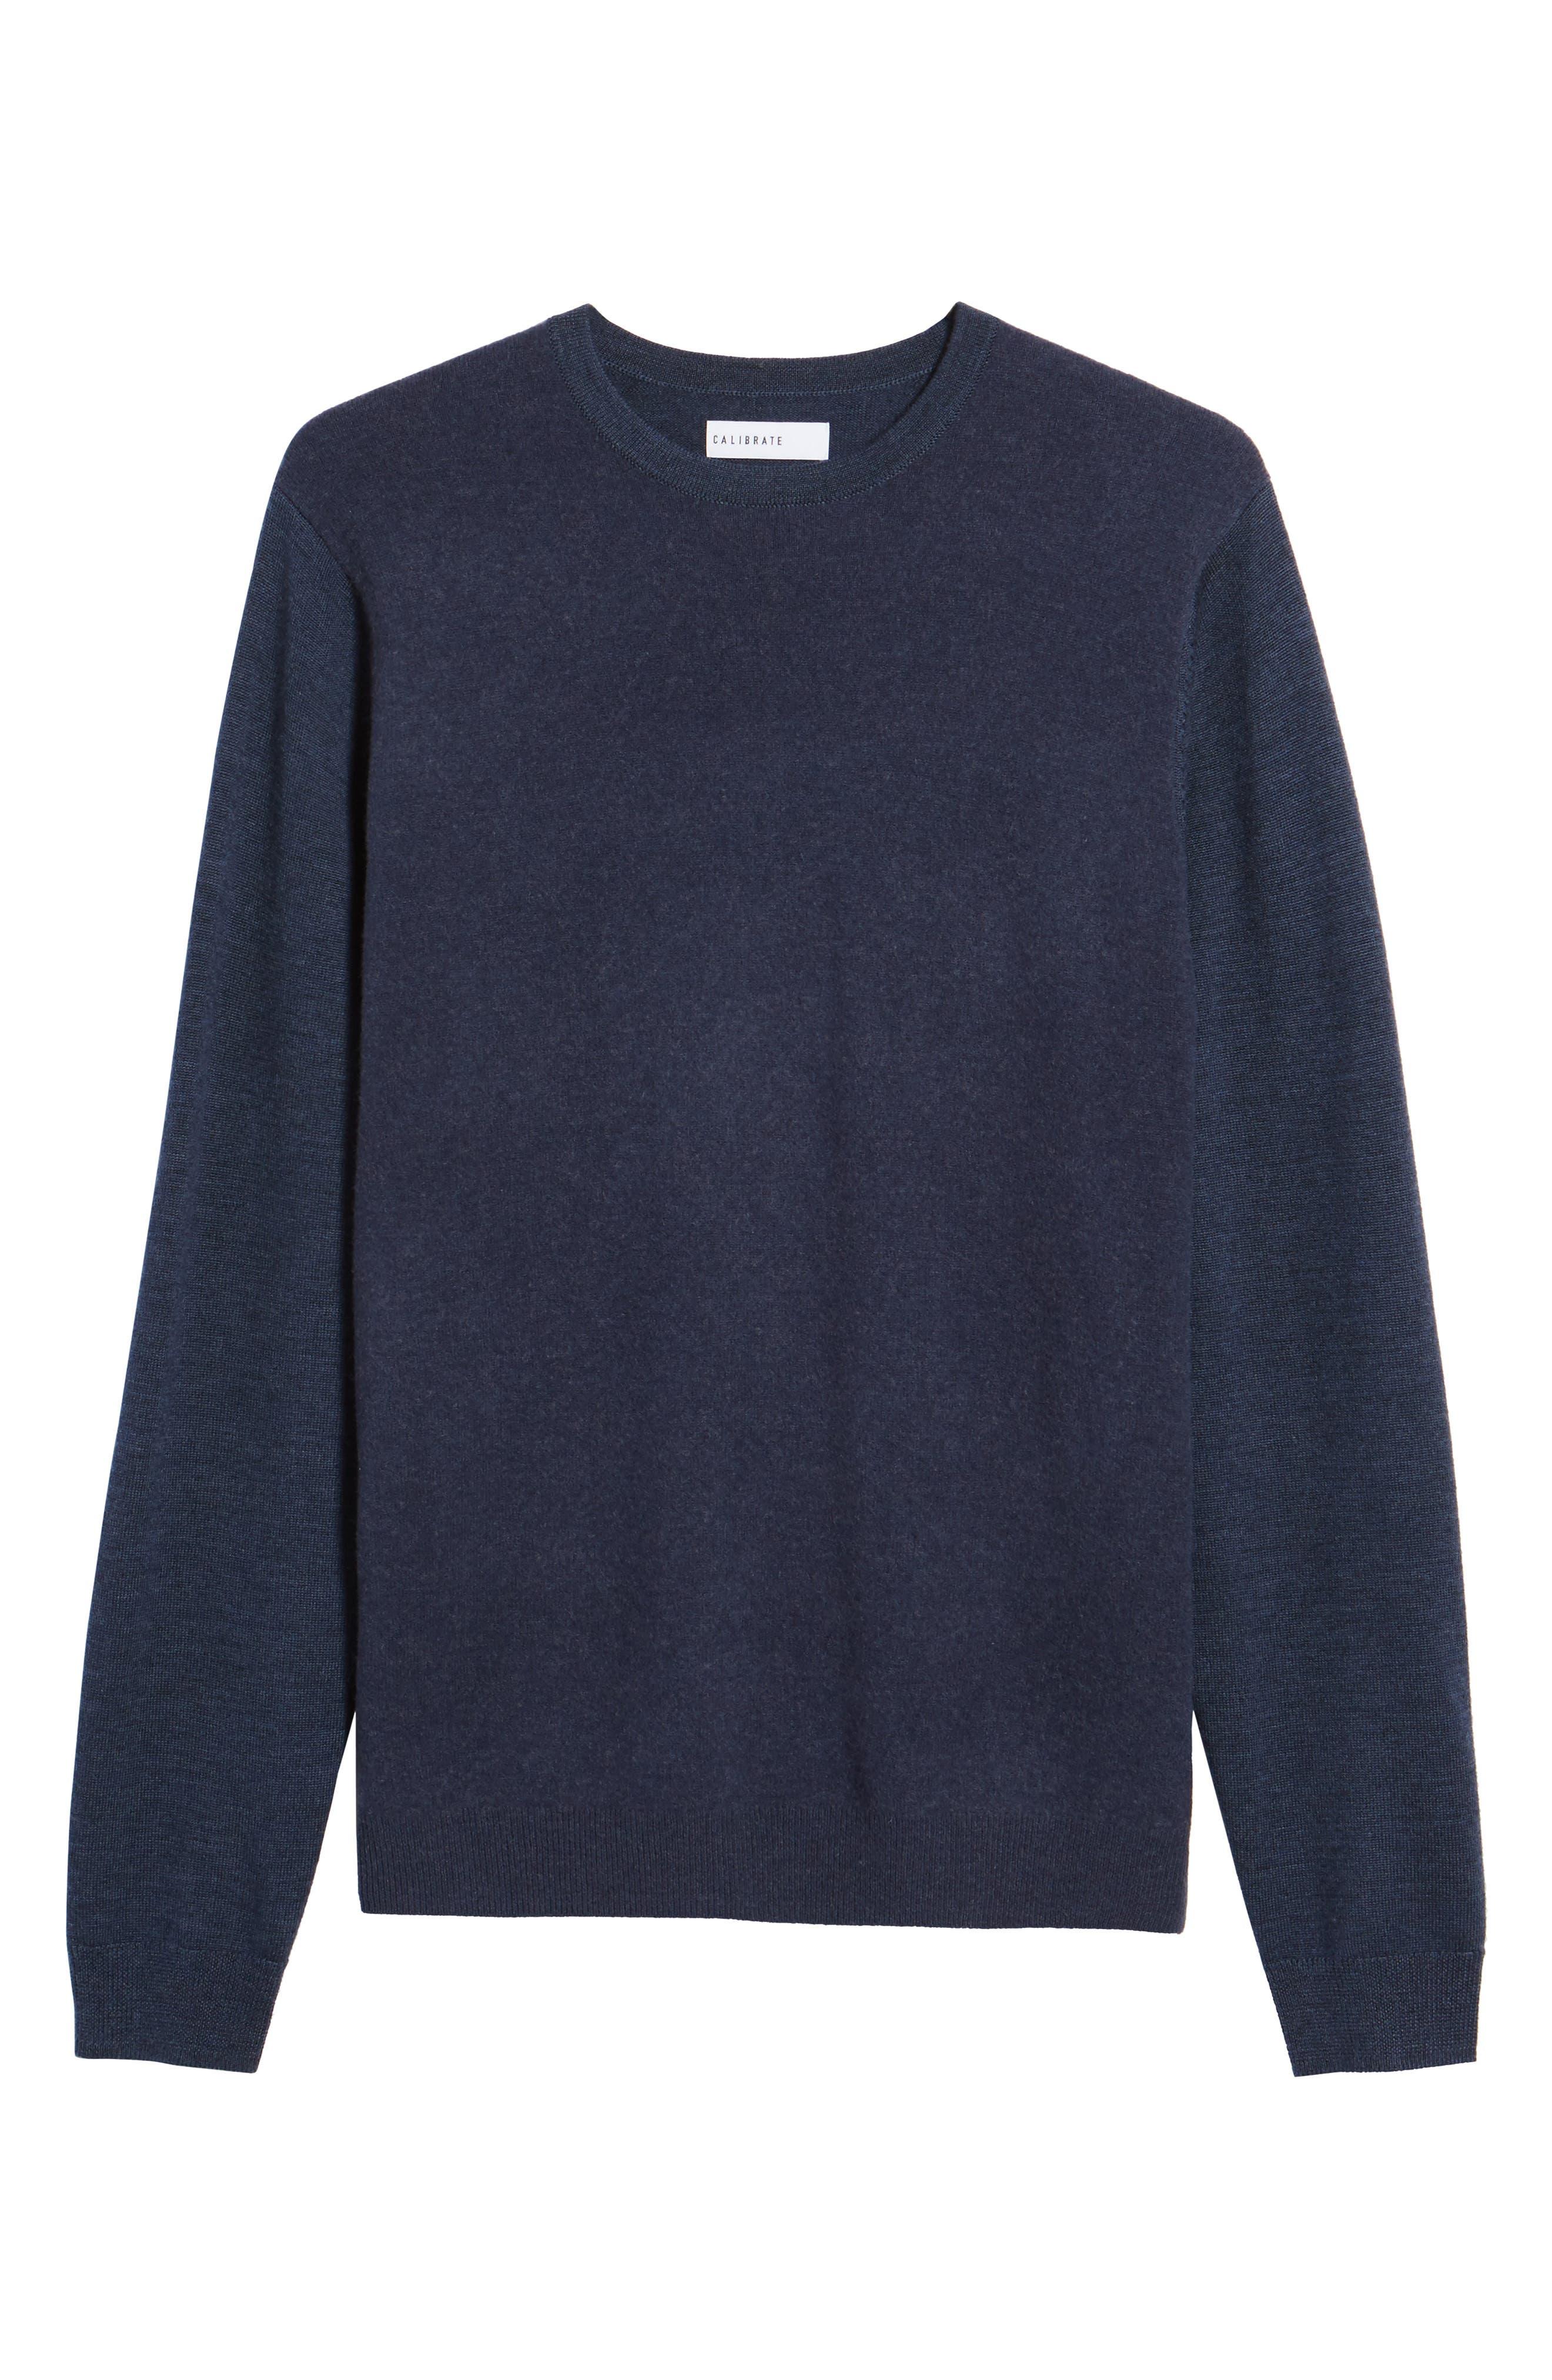 Merino Wool Blend Sweater,                             Alternate thumbnail 6, color,                             Navy Iris